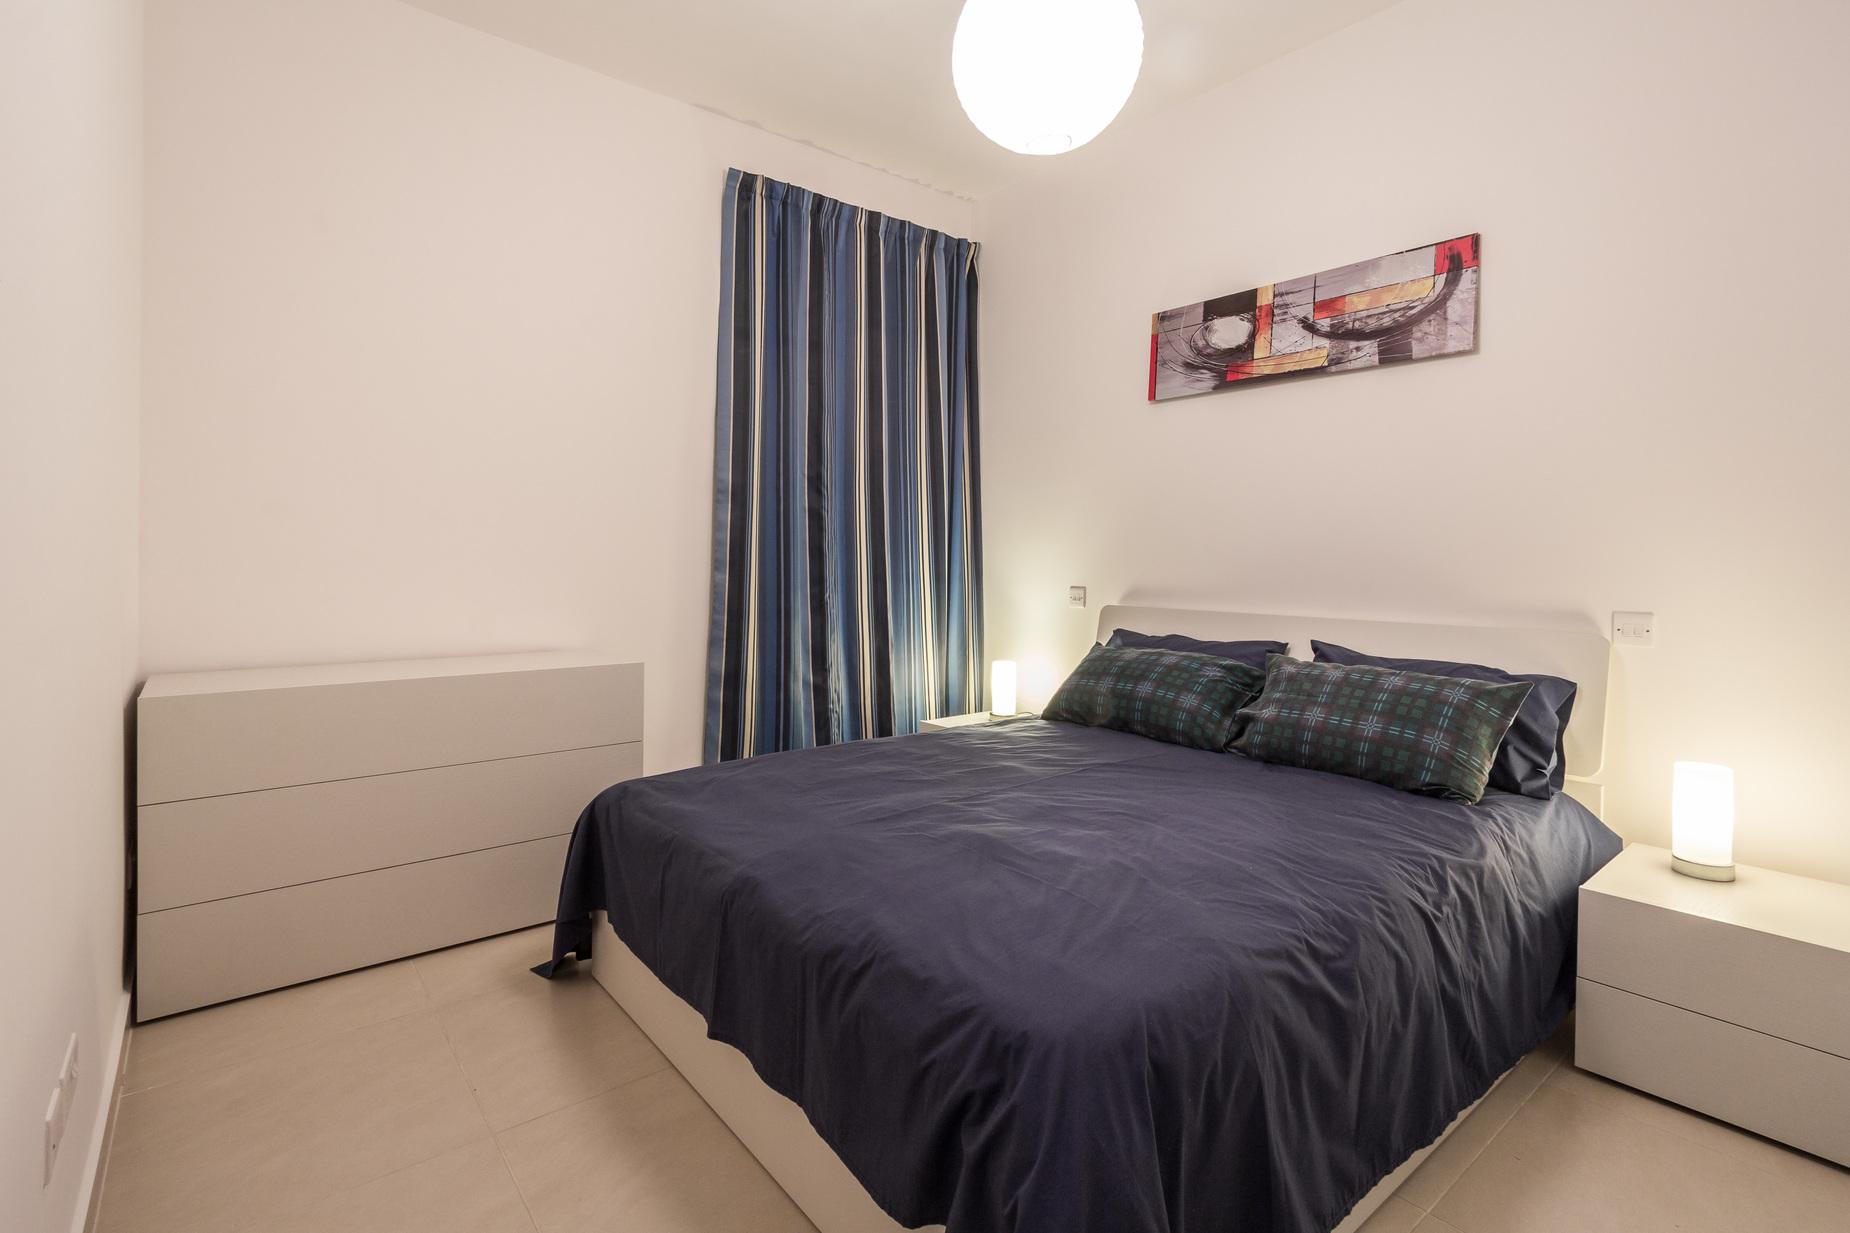 2 bed Apartment For Rent in Marsascala, Marsascala - thumb 12